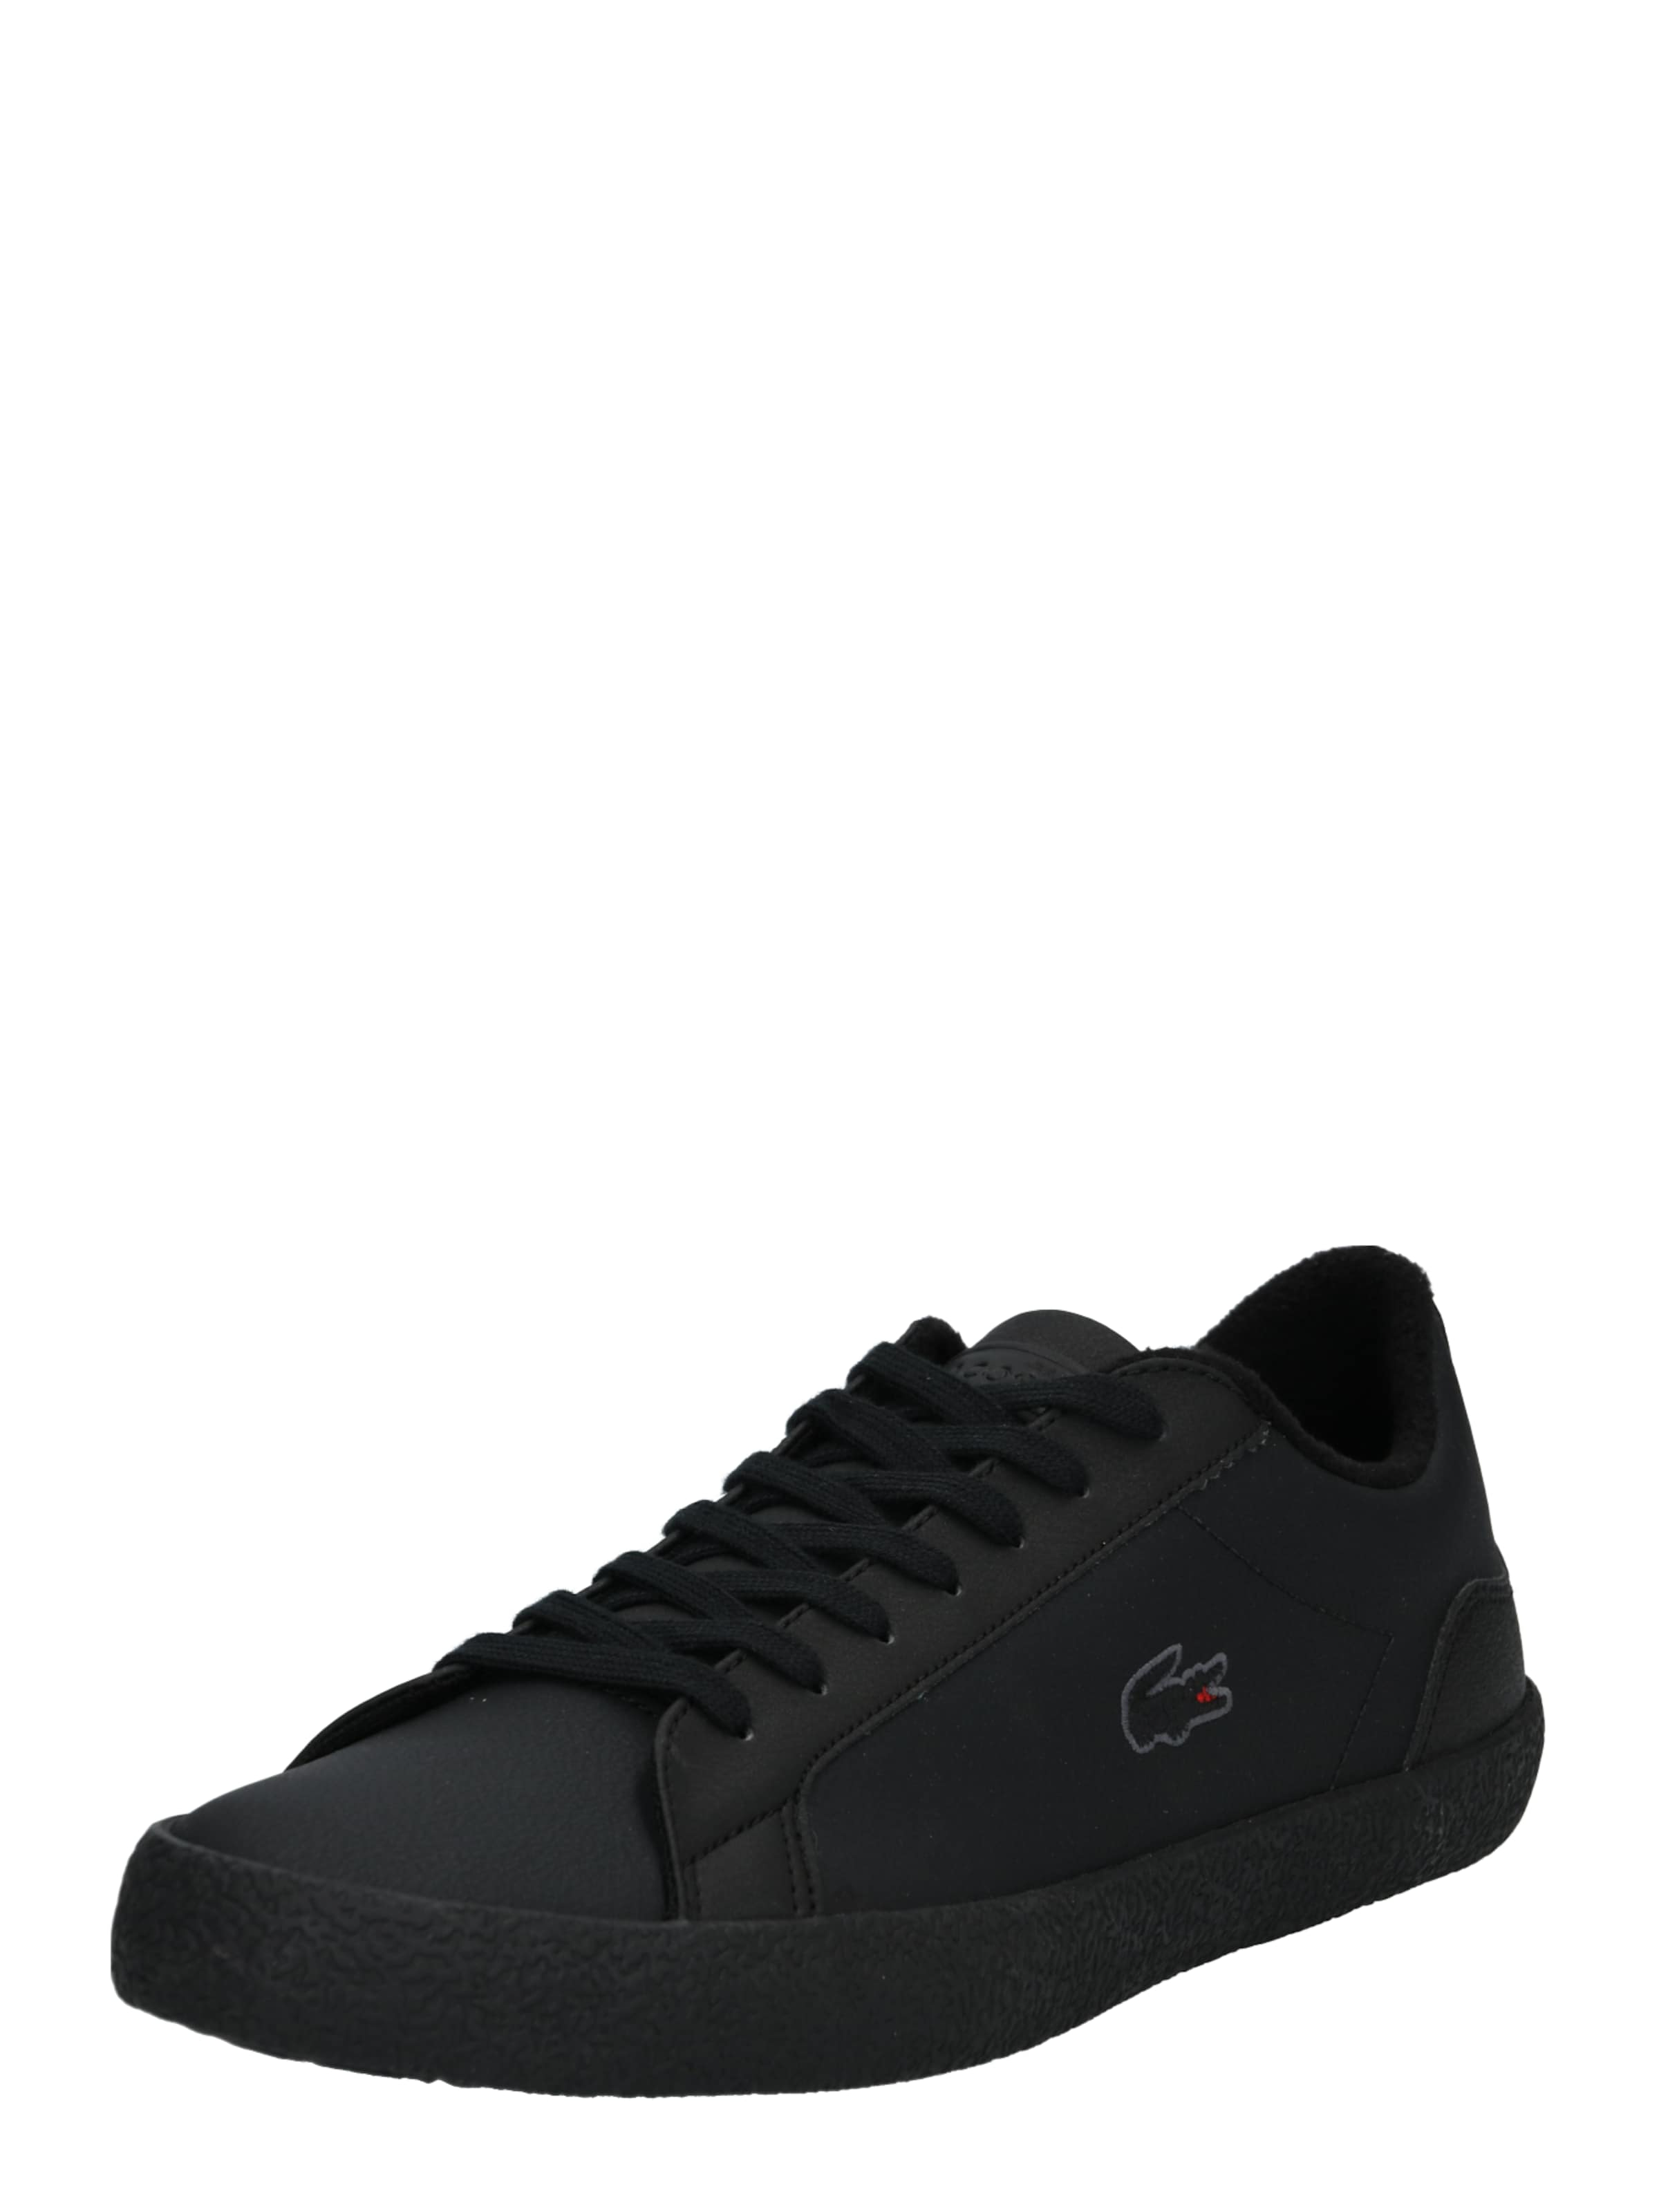 Schwarz Sneaker 319 Cma' 'lerond In Lacoste 6 nOkN8wX0P